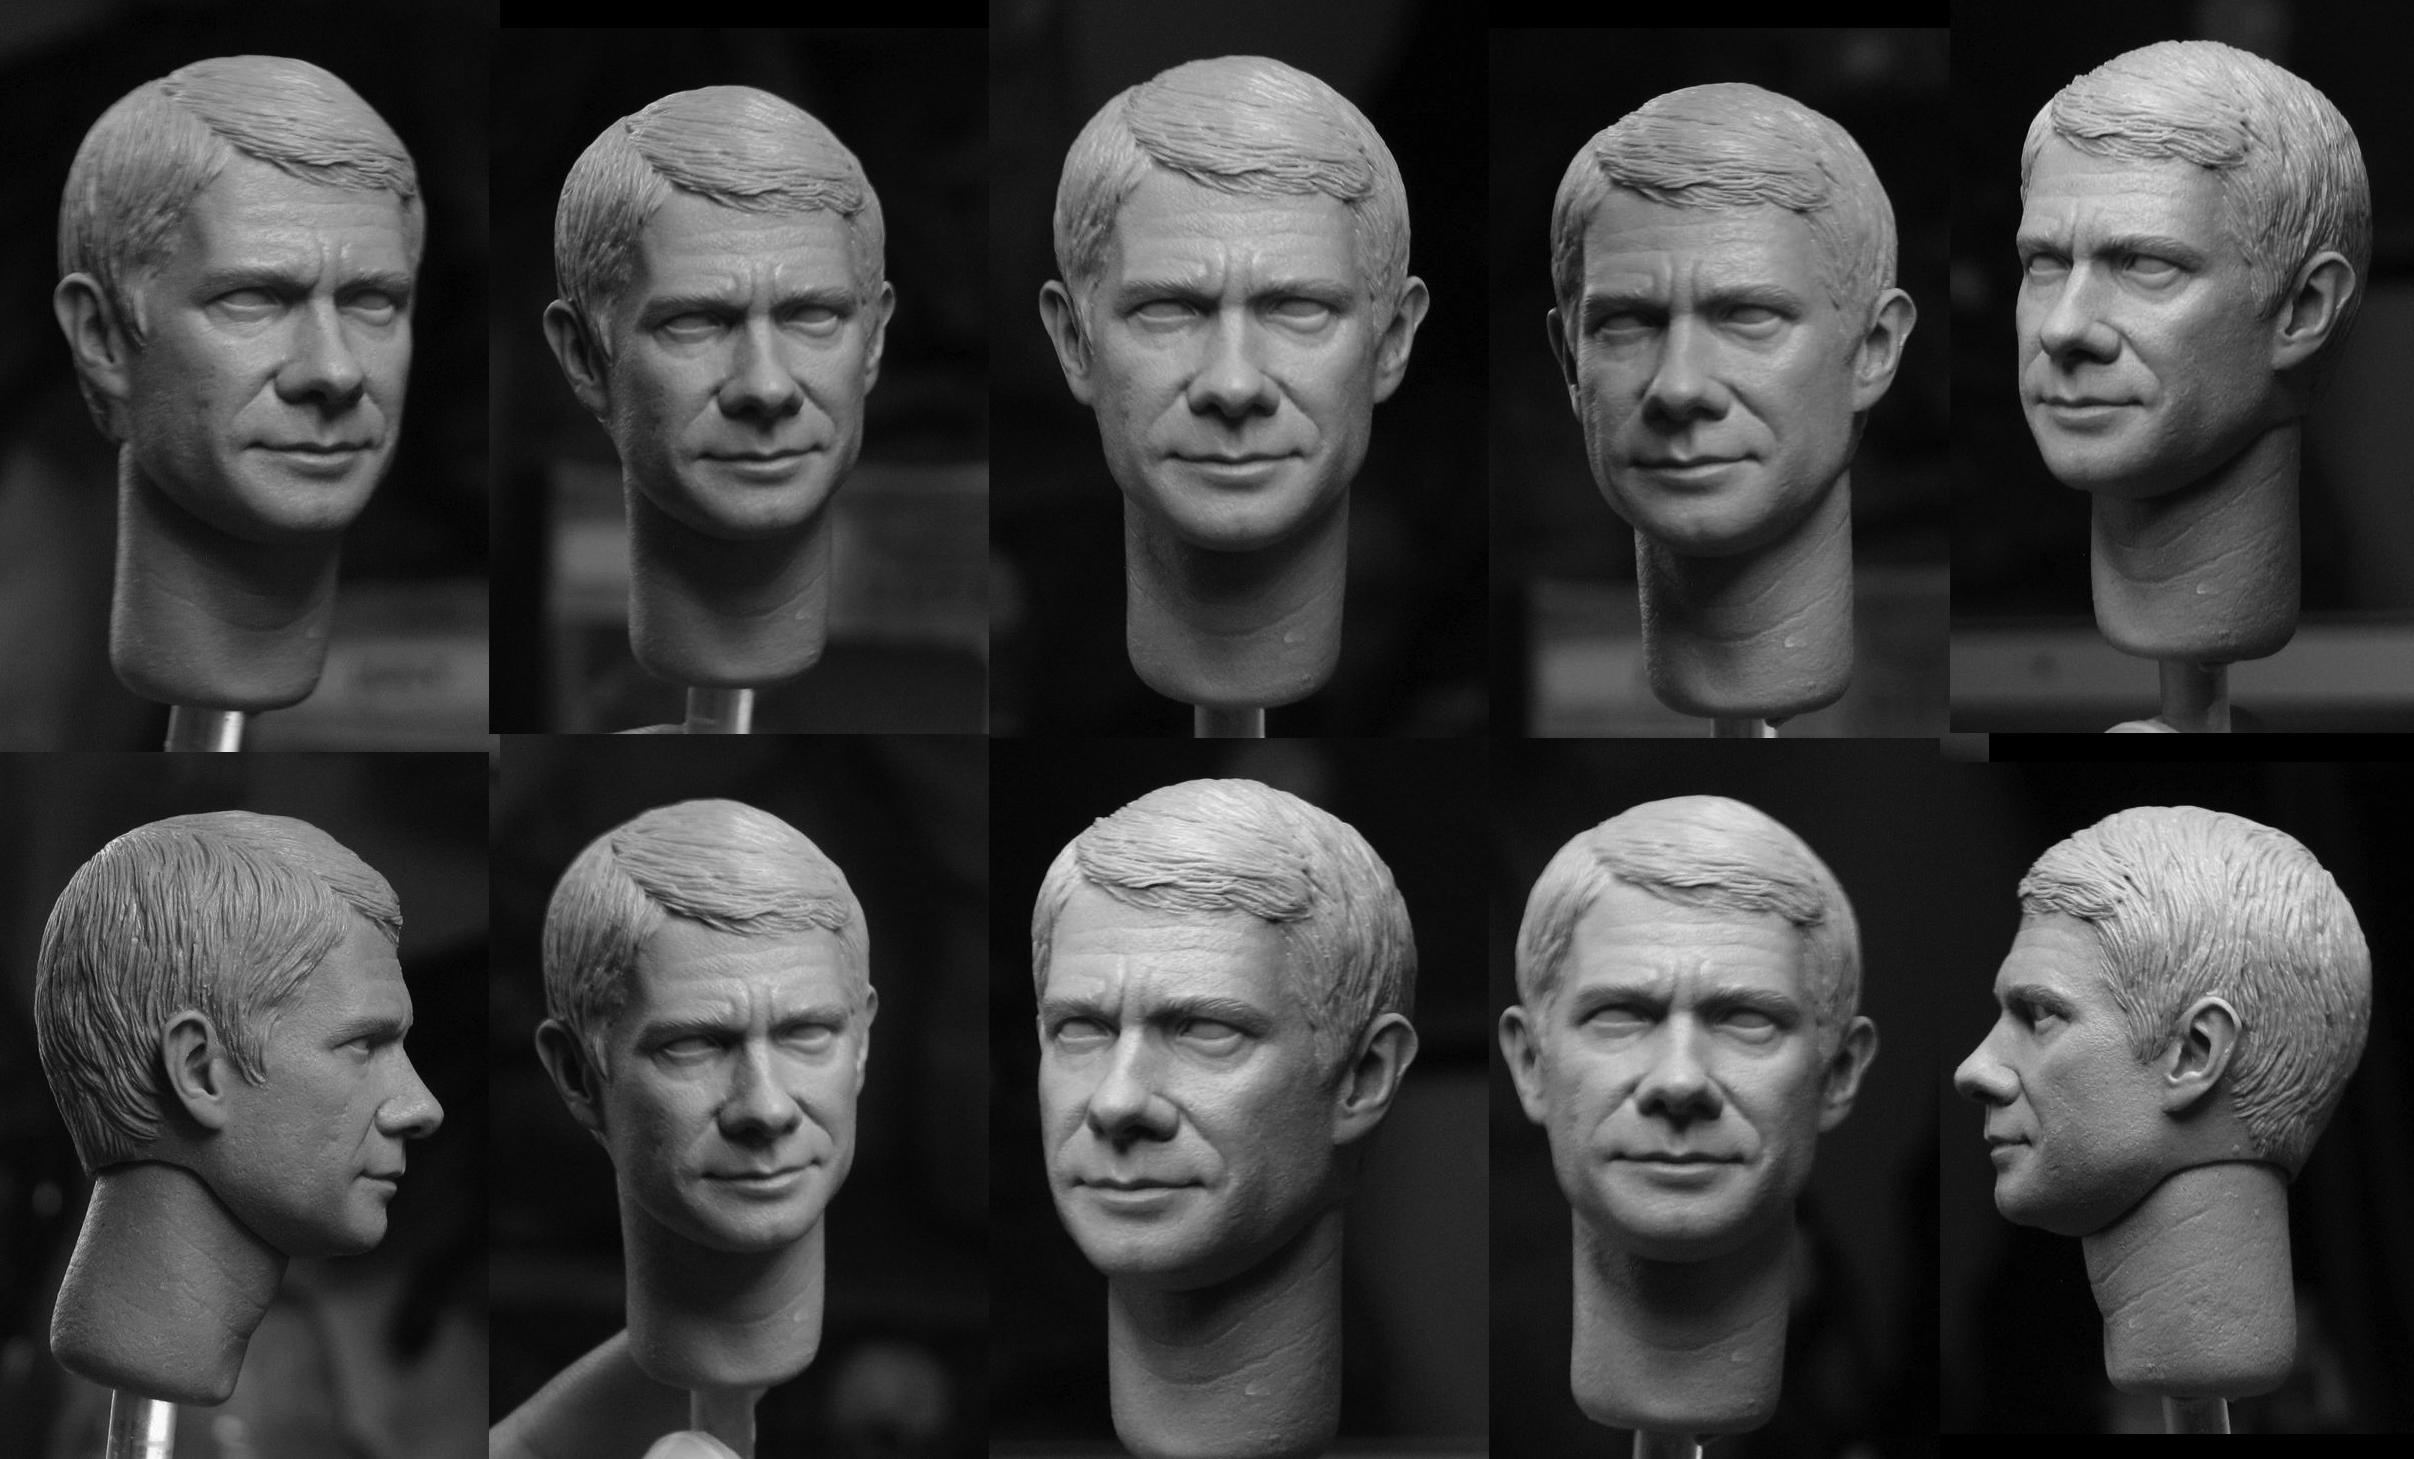 [Big Chief Studios] BBC Sherlock 1/6 scale figures Watson_bbc_by_trevorgrove-d5tgpyb